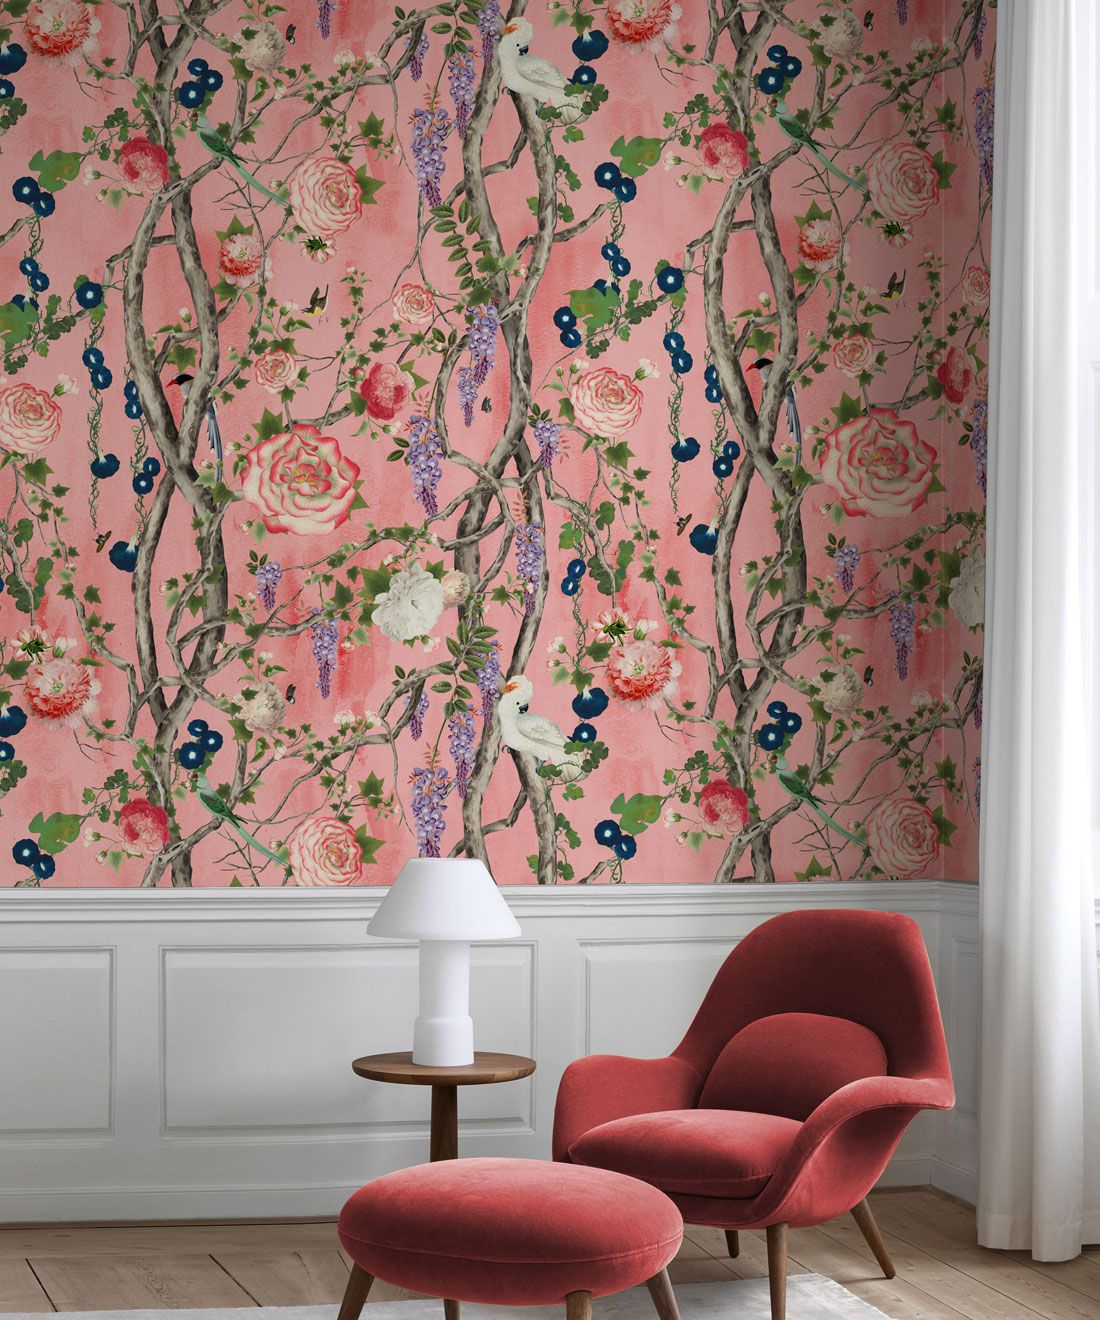 Empress Wallpaper • Romantic Wallpaper • Floral Wallpaper • Chinoiserie Wallpaper • Coral colour wallpaper insitu